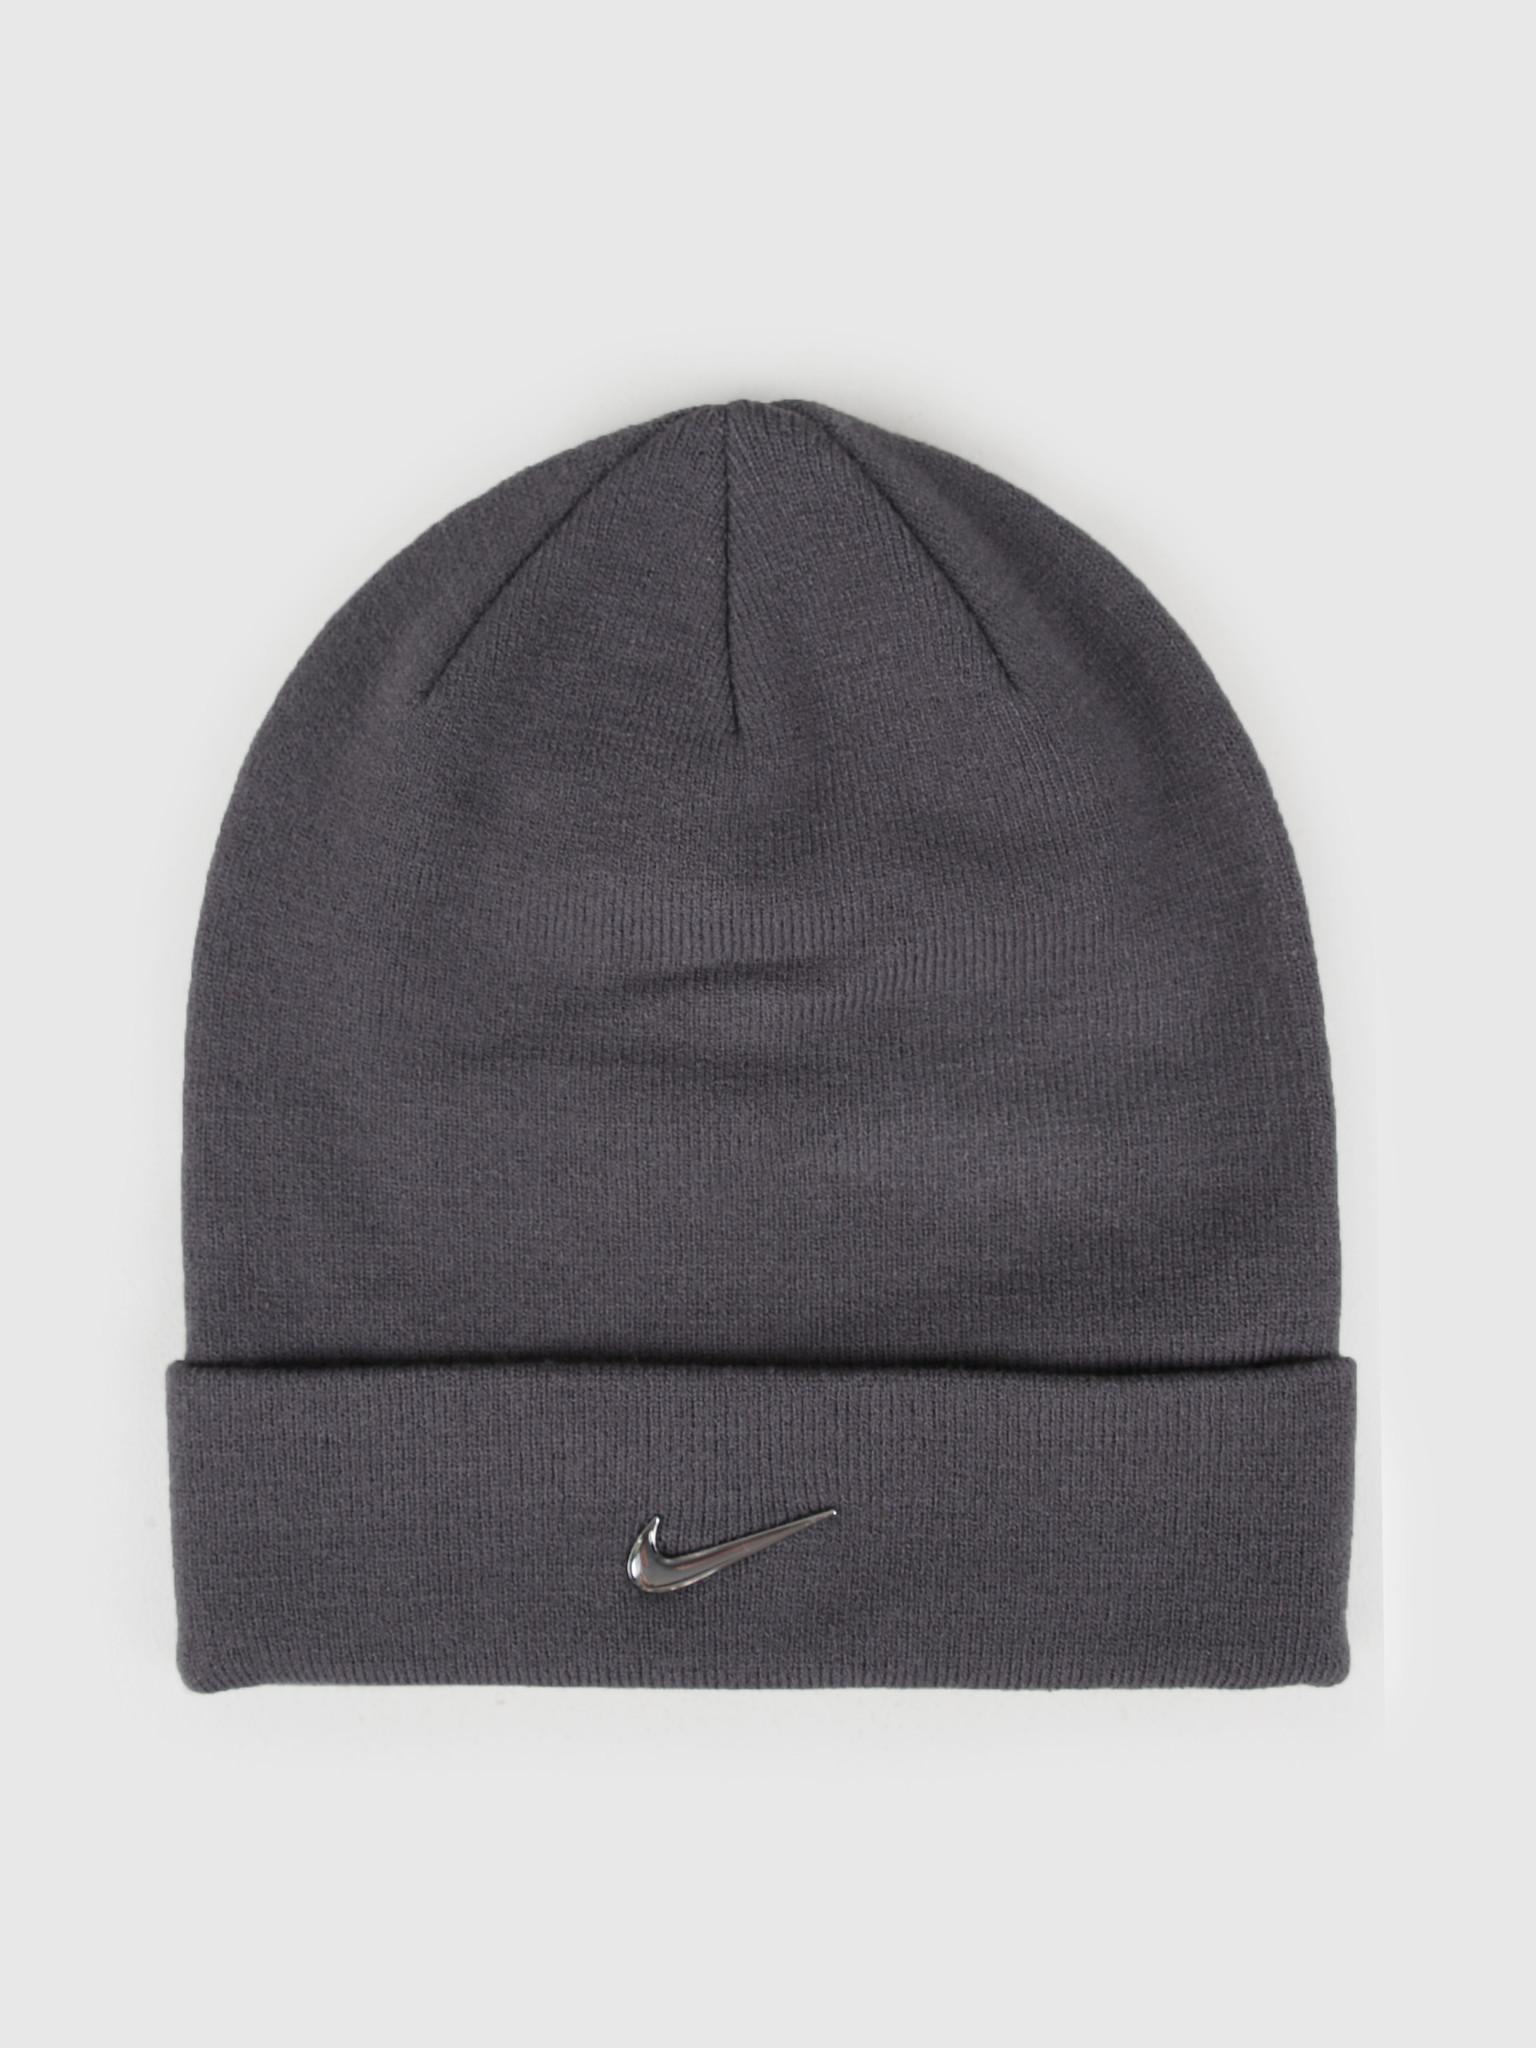 Nike Nike Swoosh Beanie Dark Grey Metallic Silver 803734-021